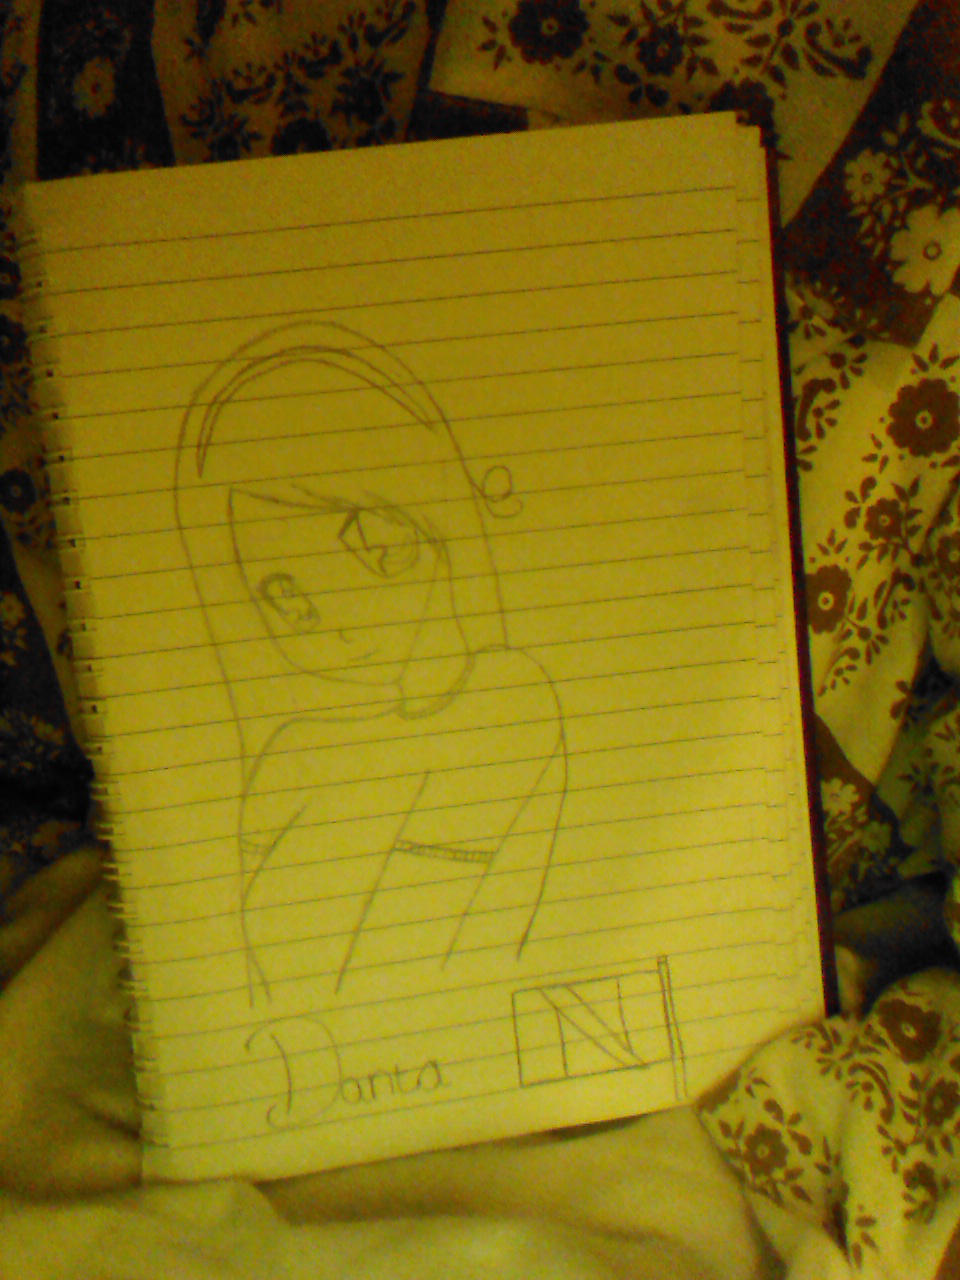 my drawing of dantania by dantania-dan